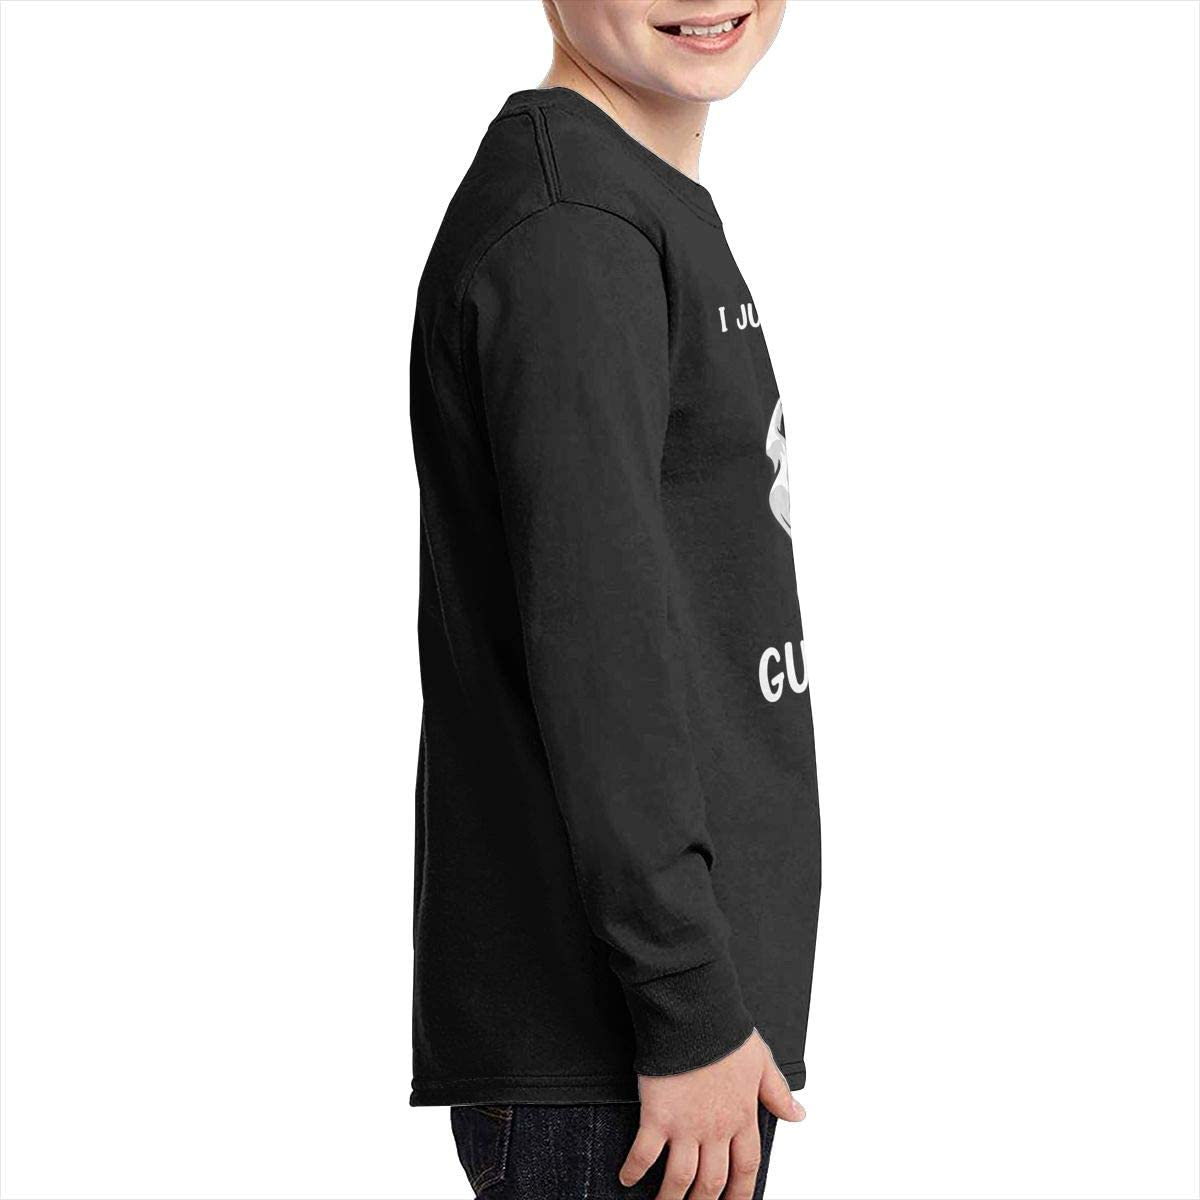 Teenagers Teen Boy I Just Really Like Guinea Pigs OK Printed Long Sleeve 100/% Cotton T Shirts